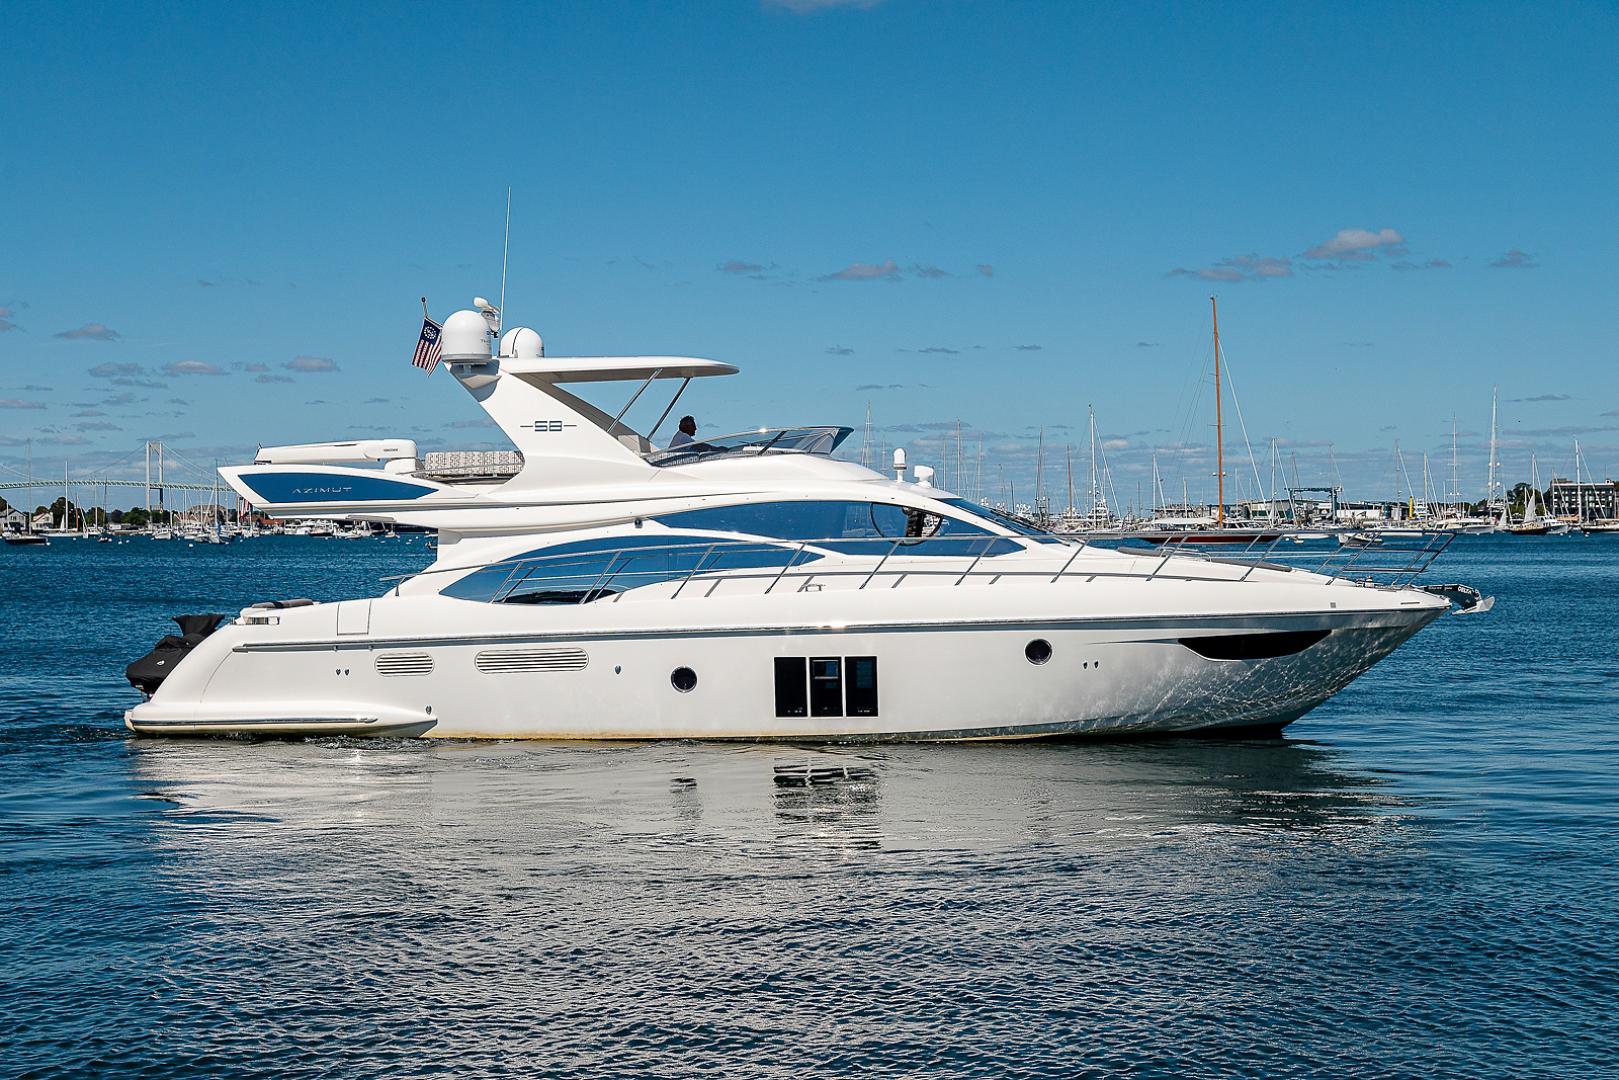 Azimut-58 Fly Motor Yacht 2011-Nova Fort Lauderdale-Florida-United States-58_azimut_nova__profiles16-1490556 | Thumbnail